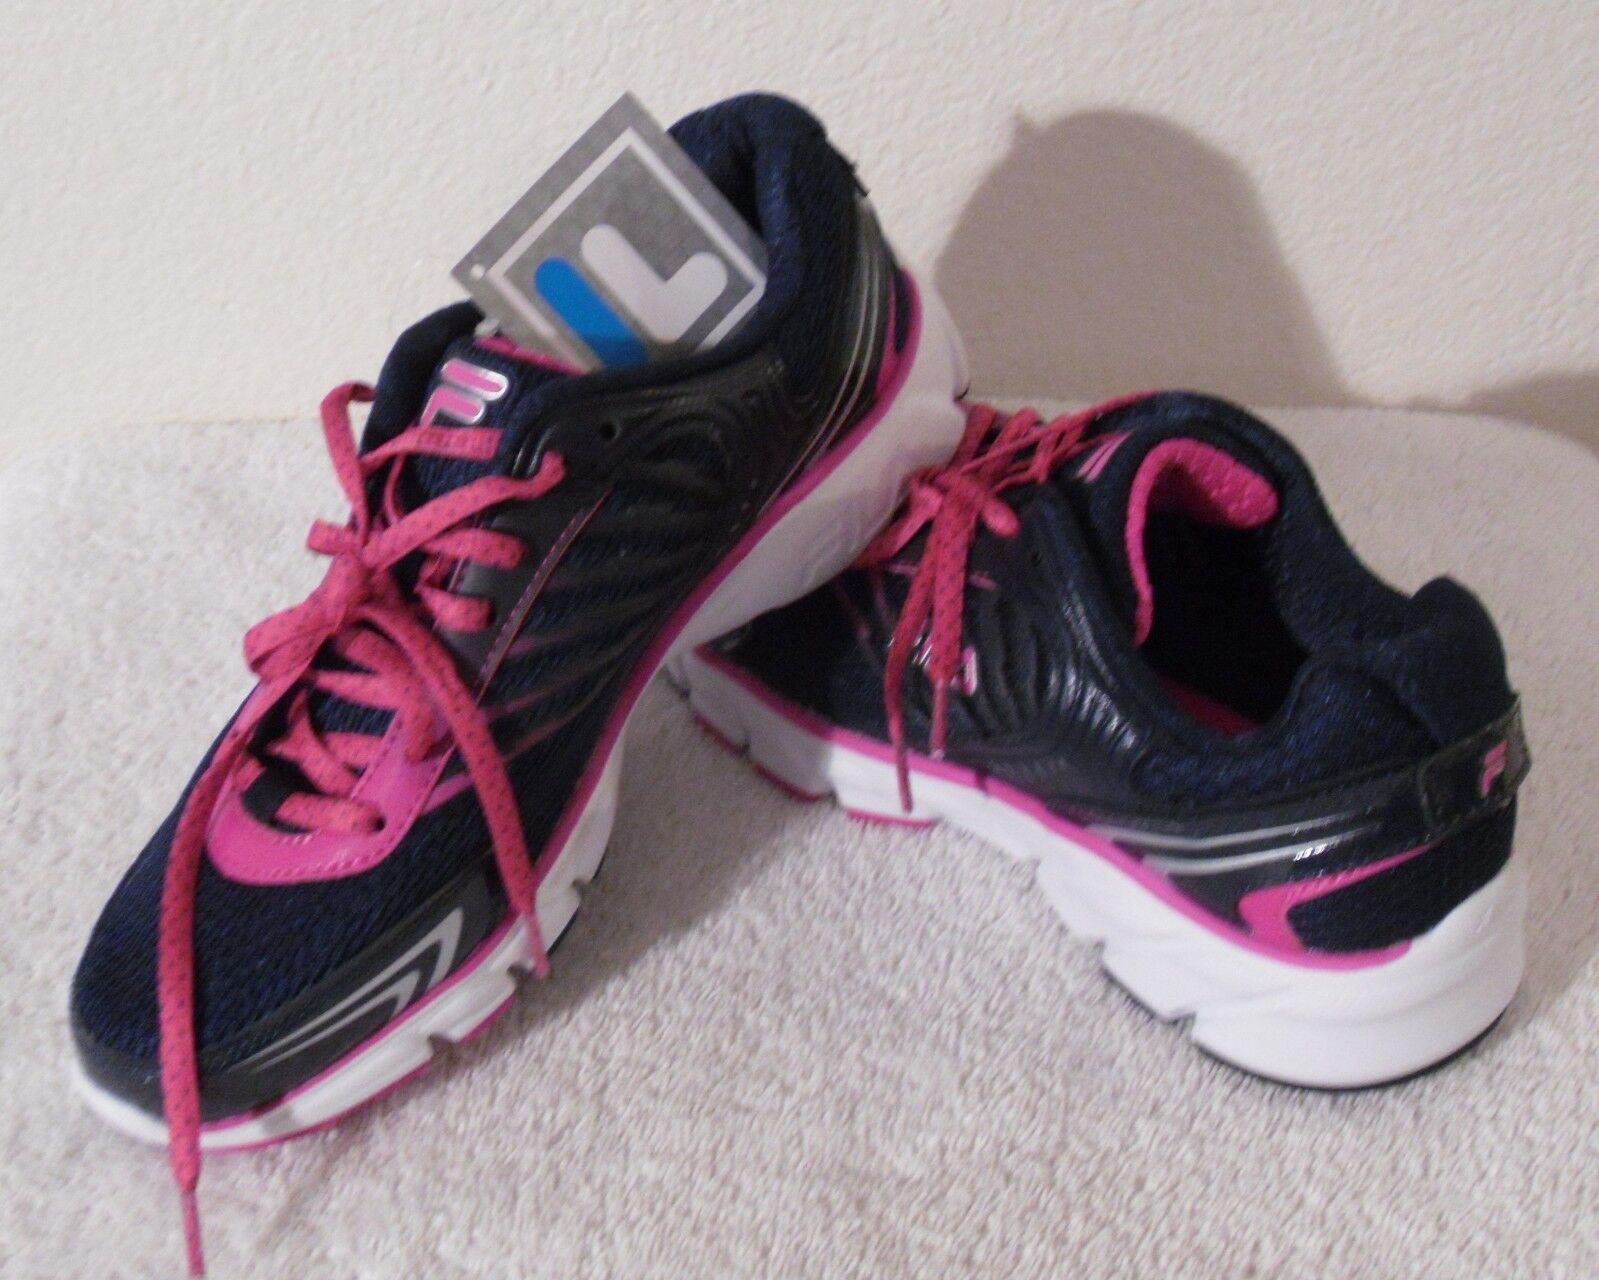 NWT Fila Maranello Womens Running/Training Shoes 9 Navy/Pink/White MSRPPrice reduction Cheap and beautiful fashion